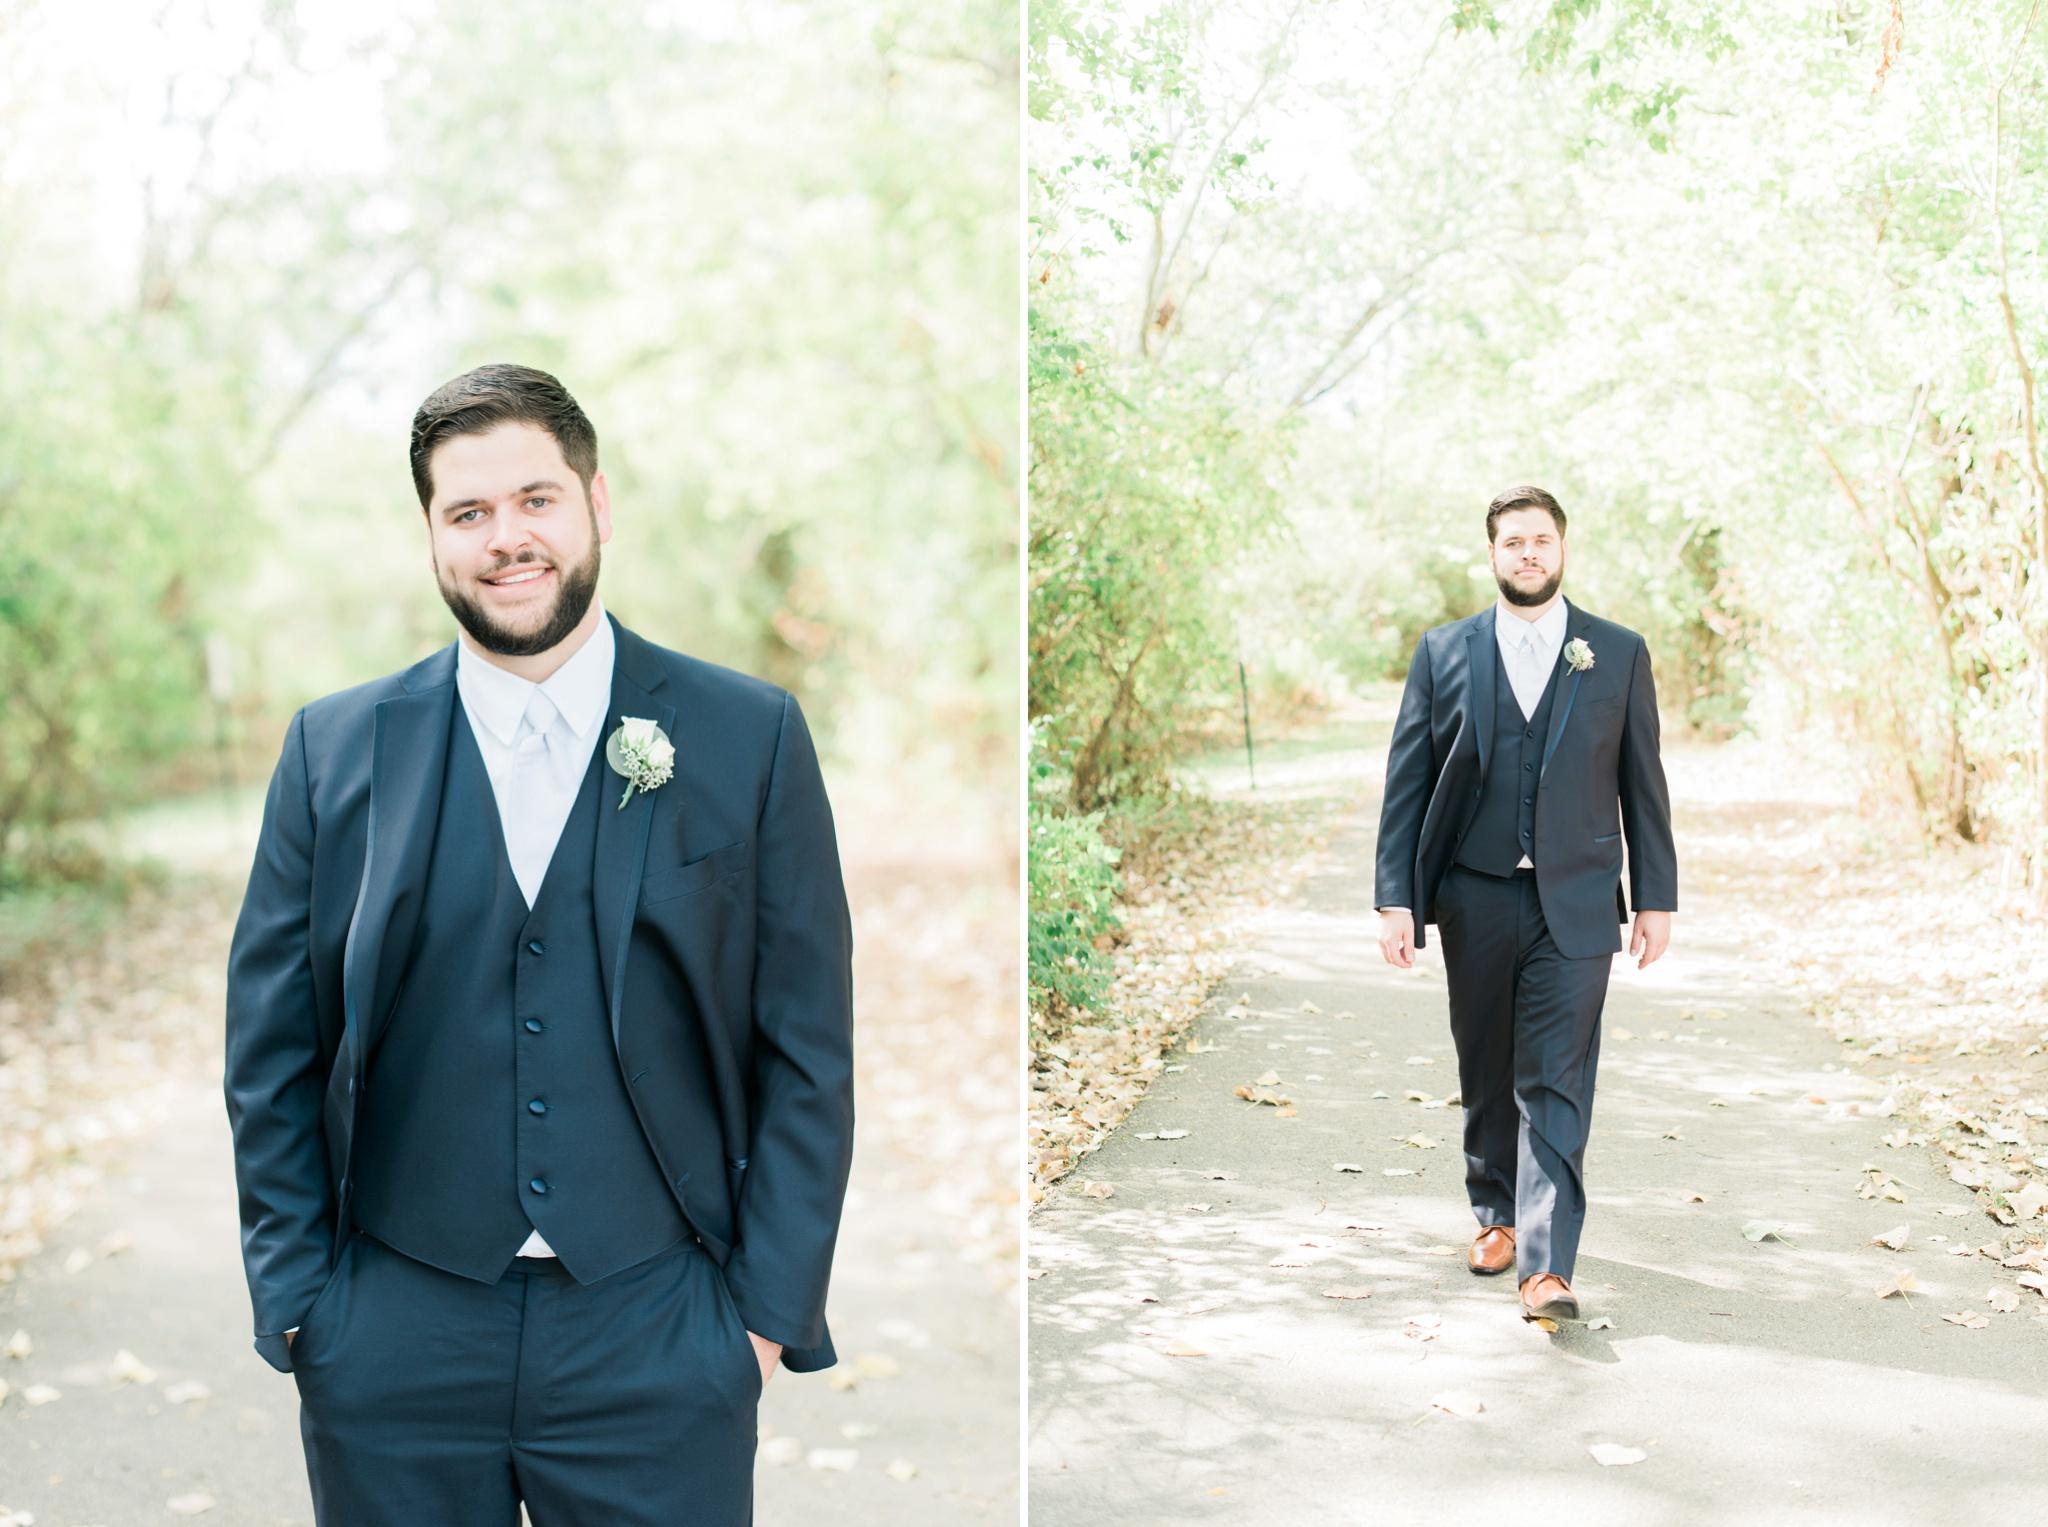 aladdin-shrine-center-wedding-grove-city-ohio-amber-jared_0026.jpg